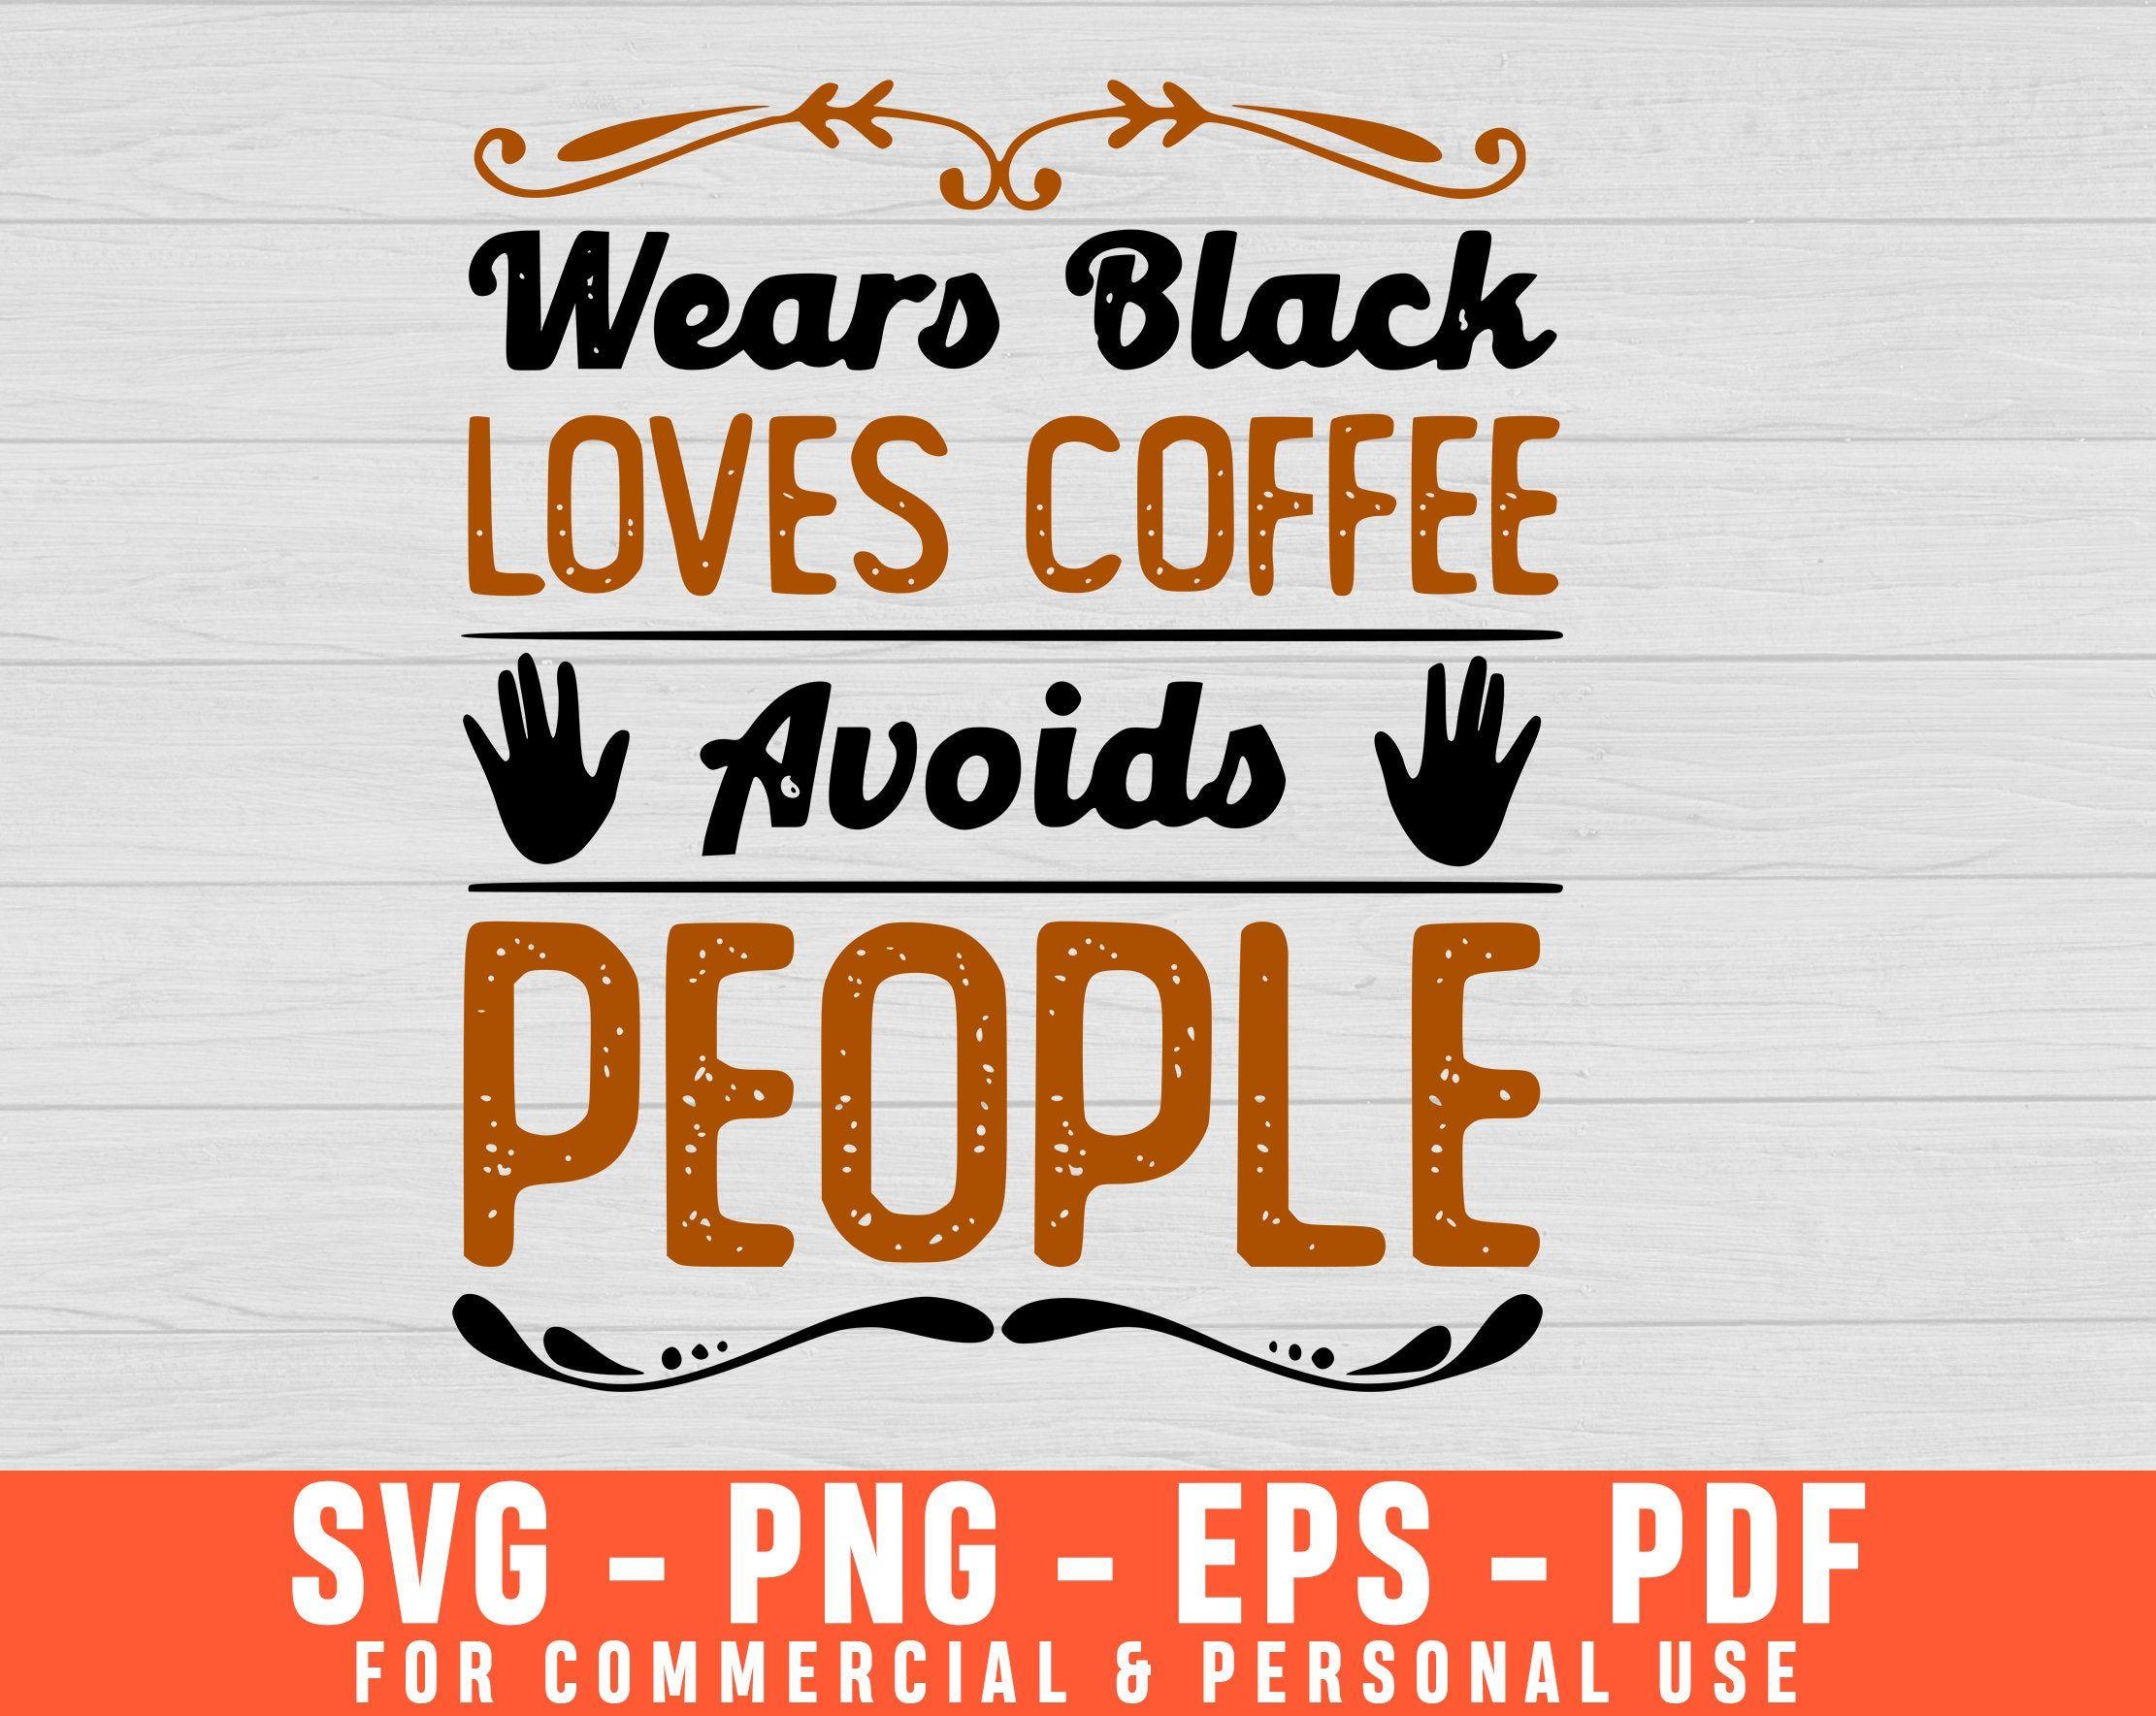 Wears Black Loves Coffee Avoids People Svg Funny Coffee Svg Etsy Coffee Quote Svg Coffee Humor Black Love